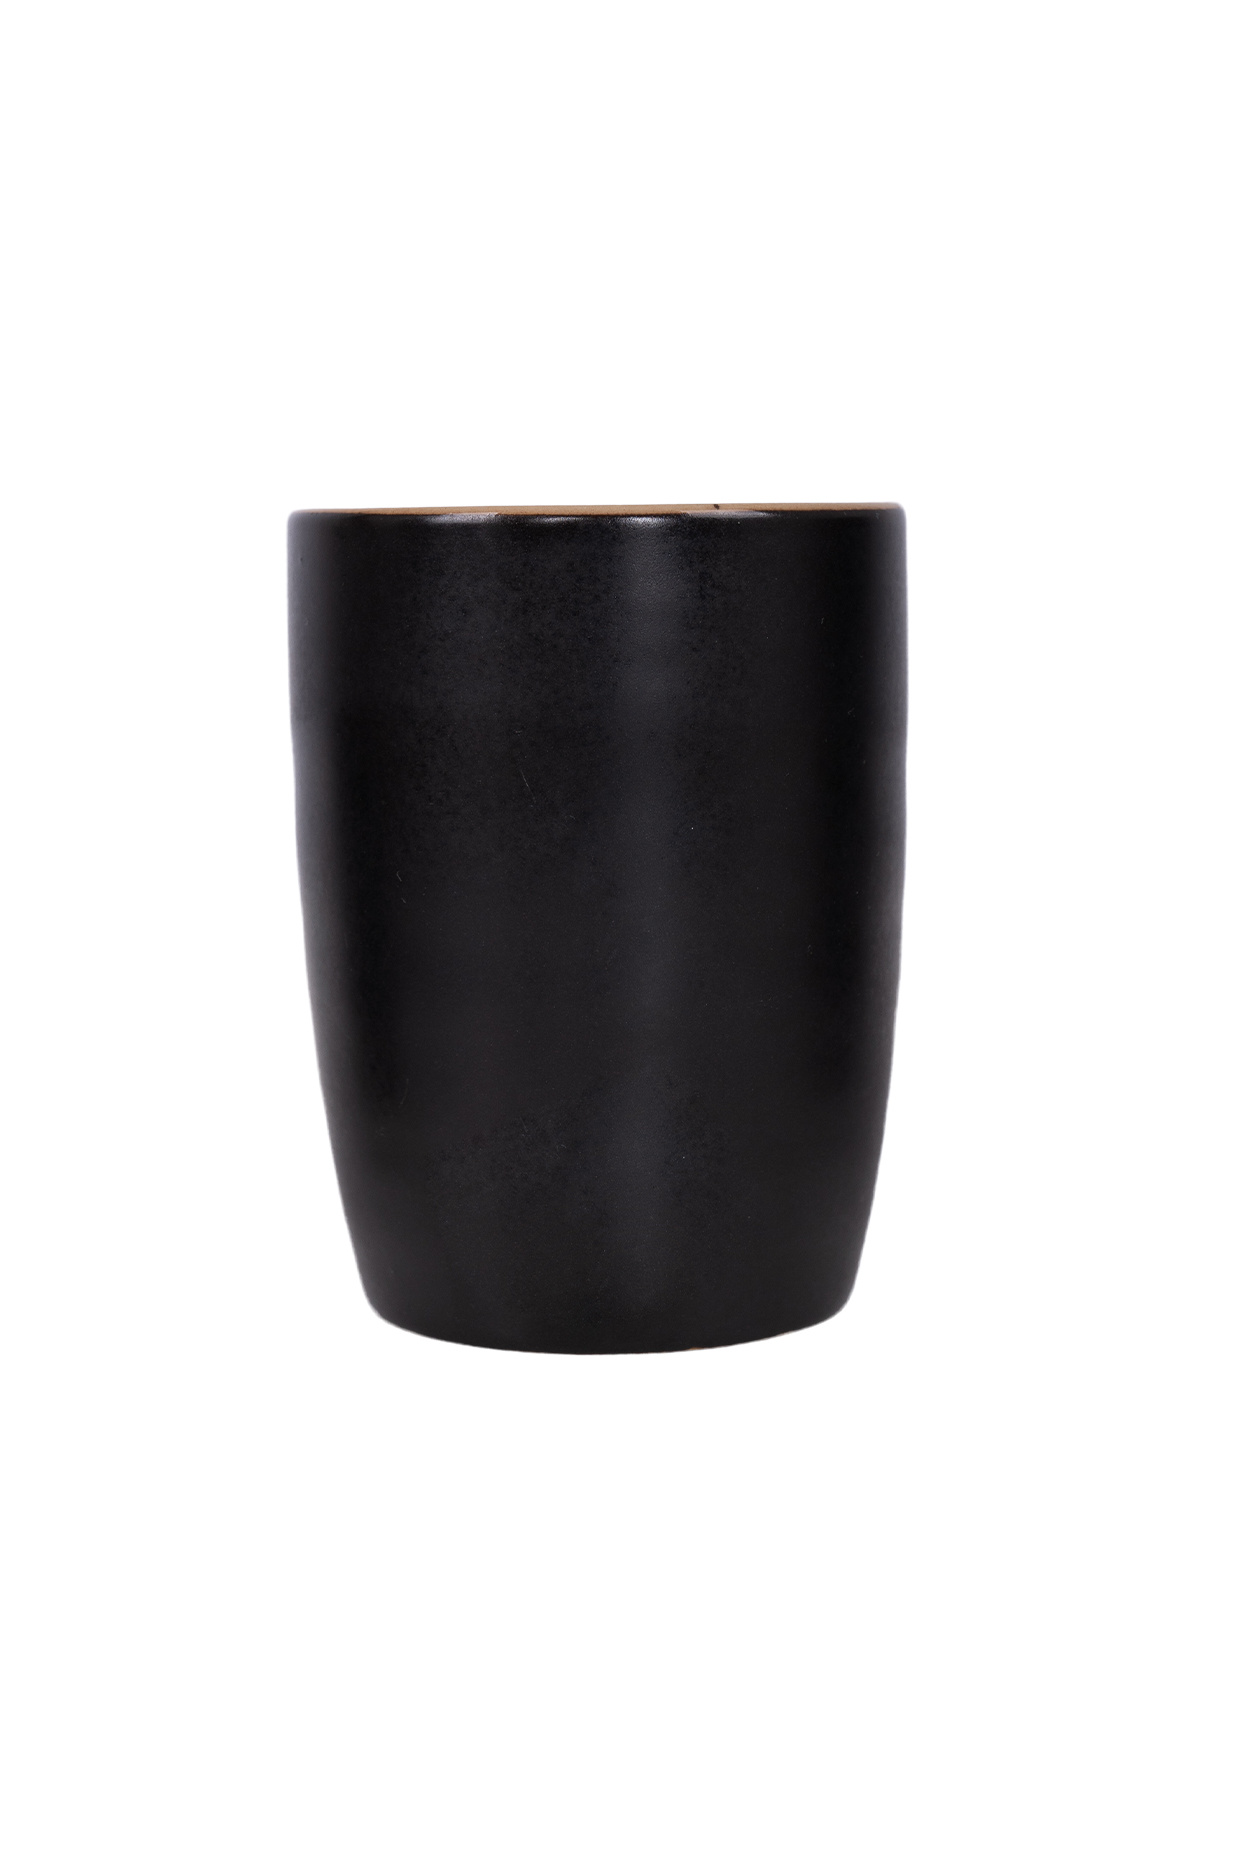 Zusss Koffiemok aardewerk -  zwart